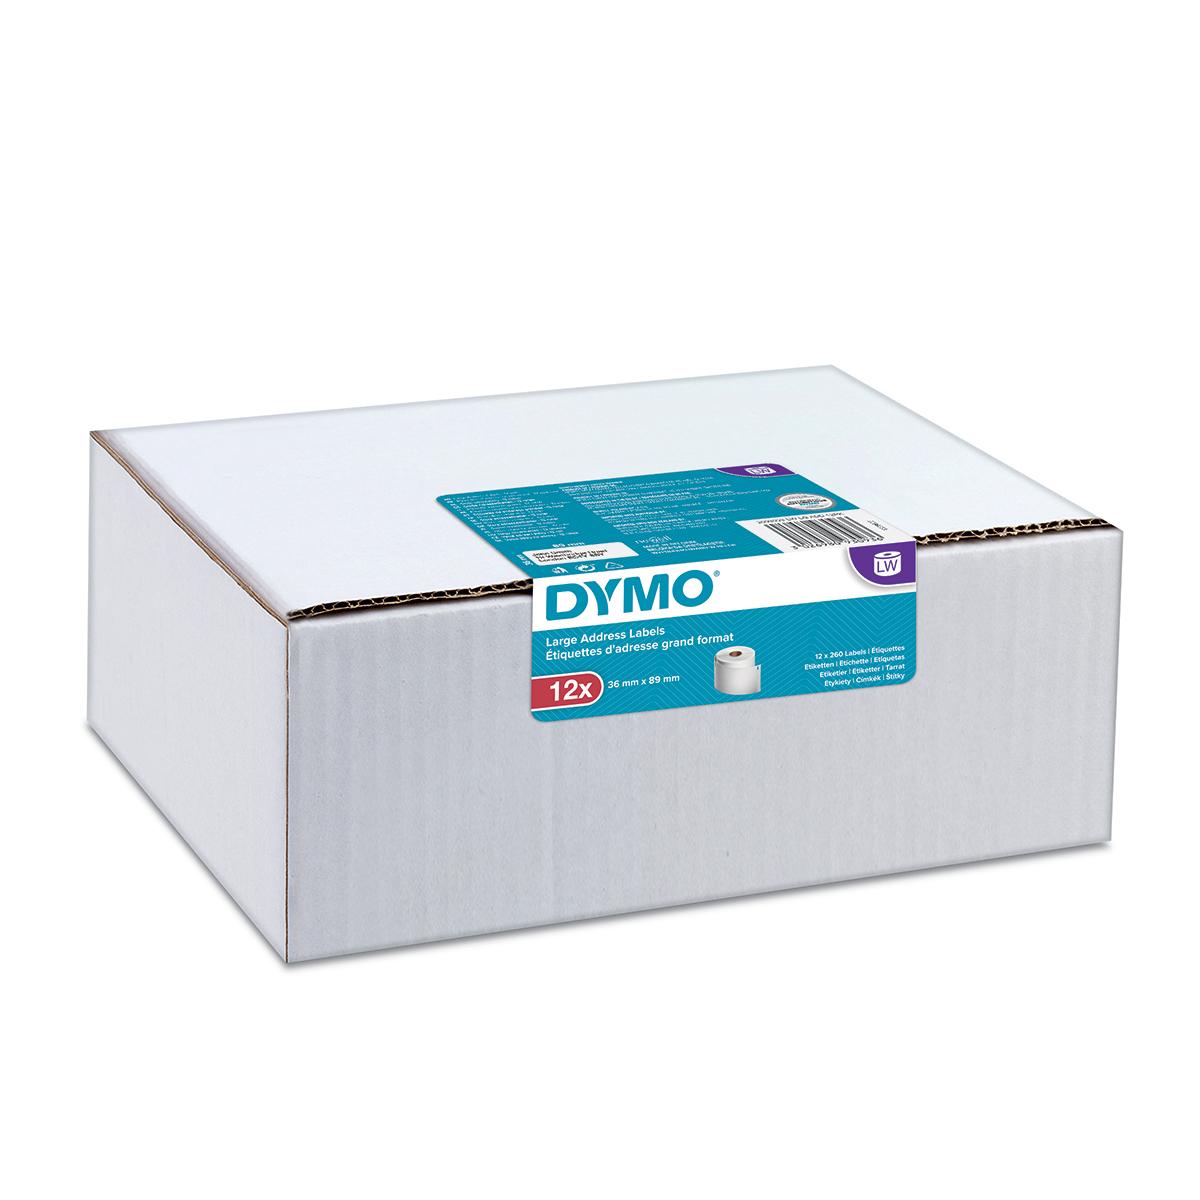 Dymo 2093093 LW Large Address Labels 36 x 89mm 12 pack